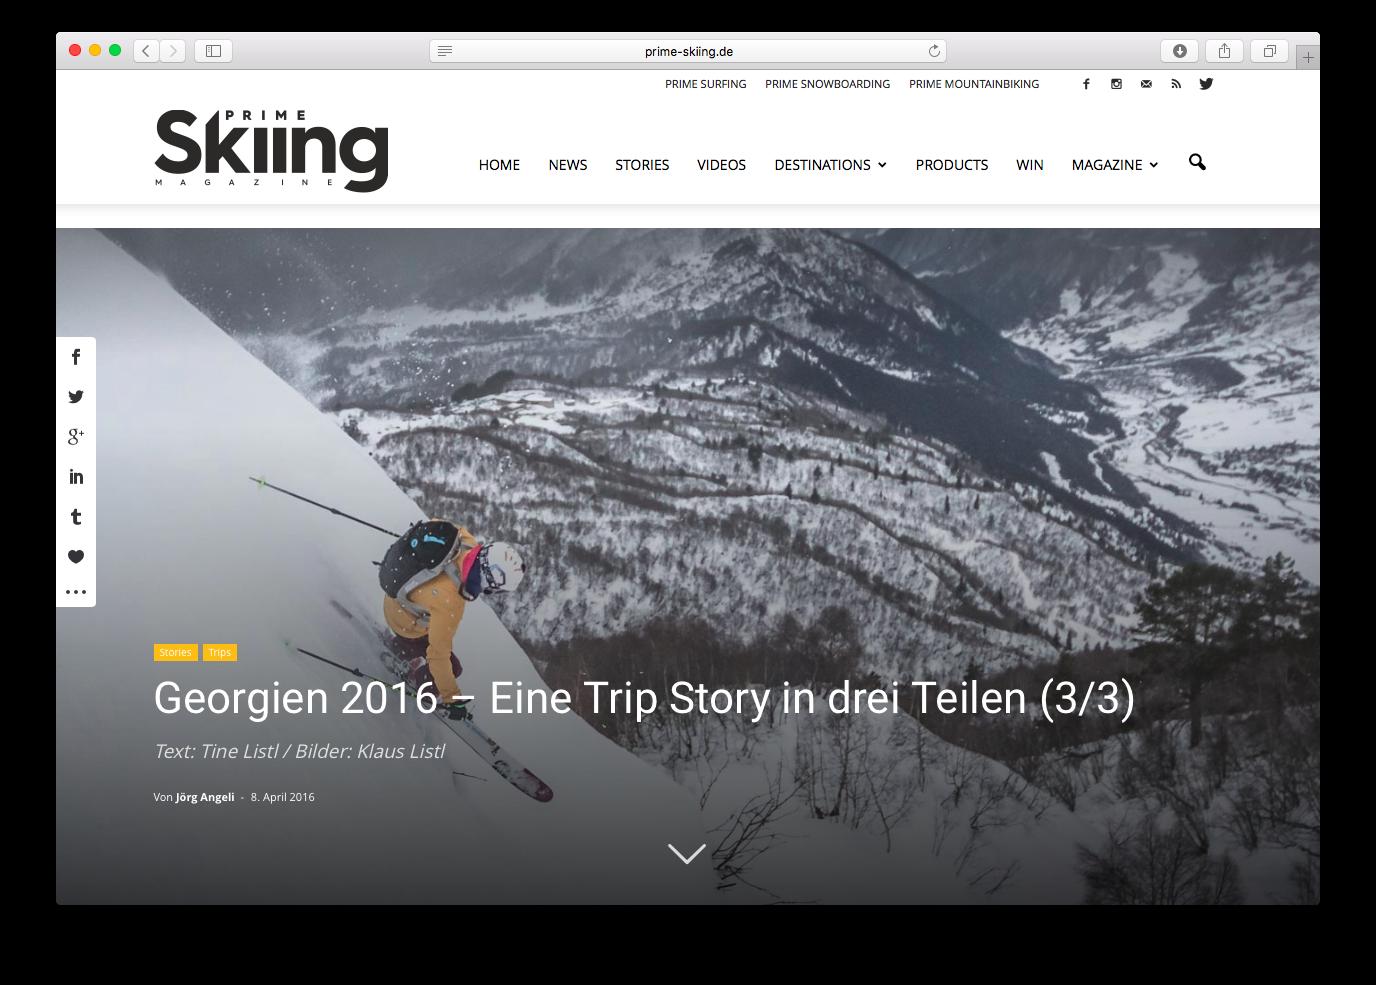 prime-skiing.de.png